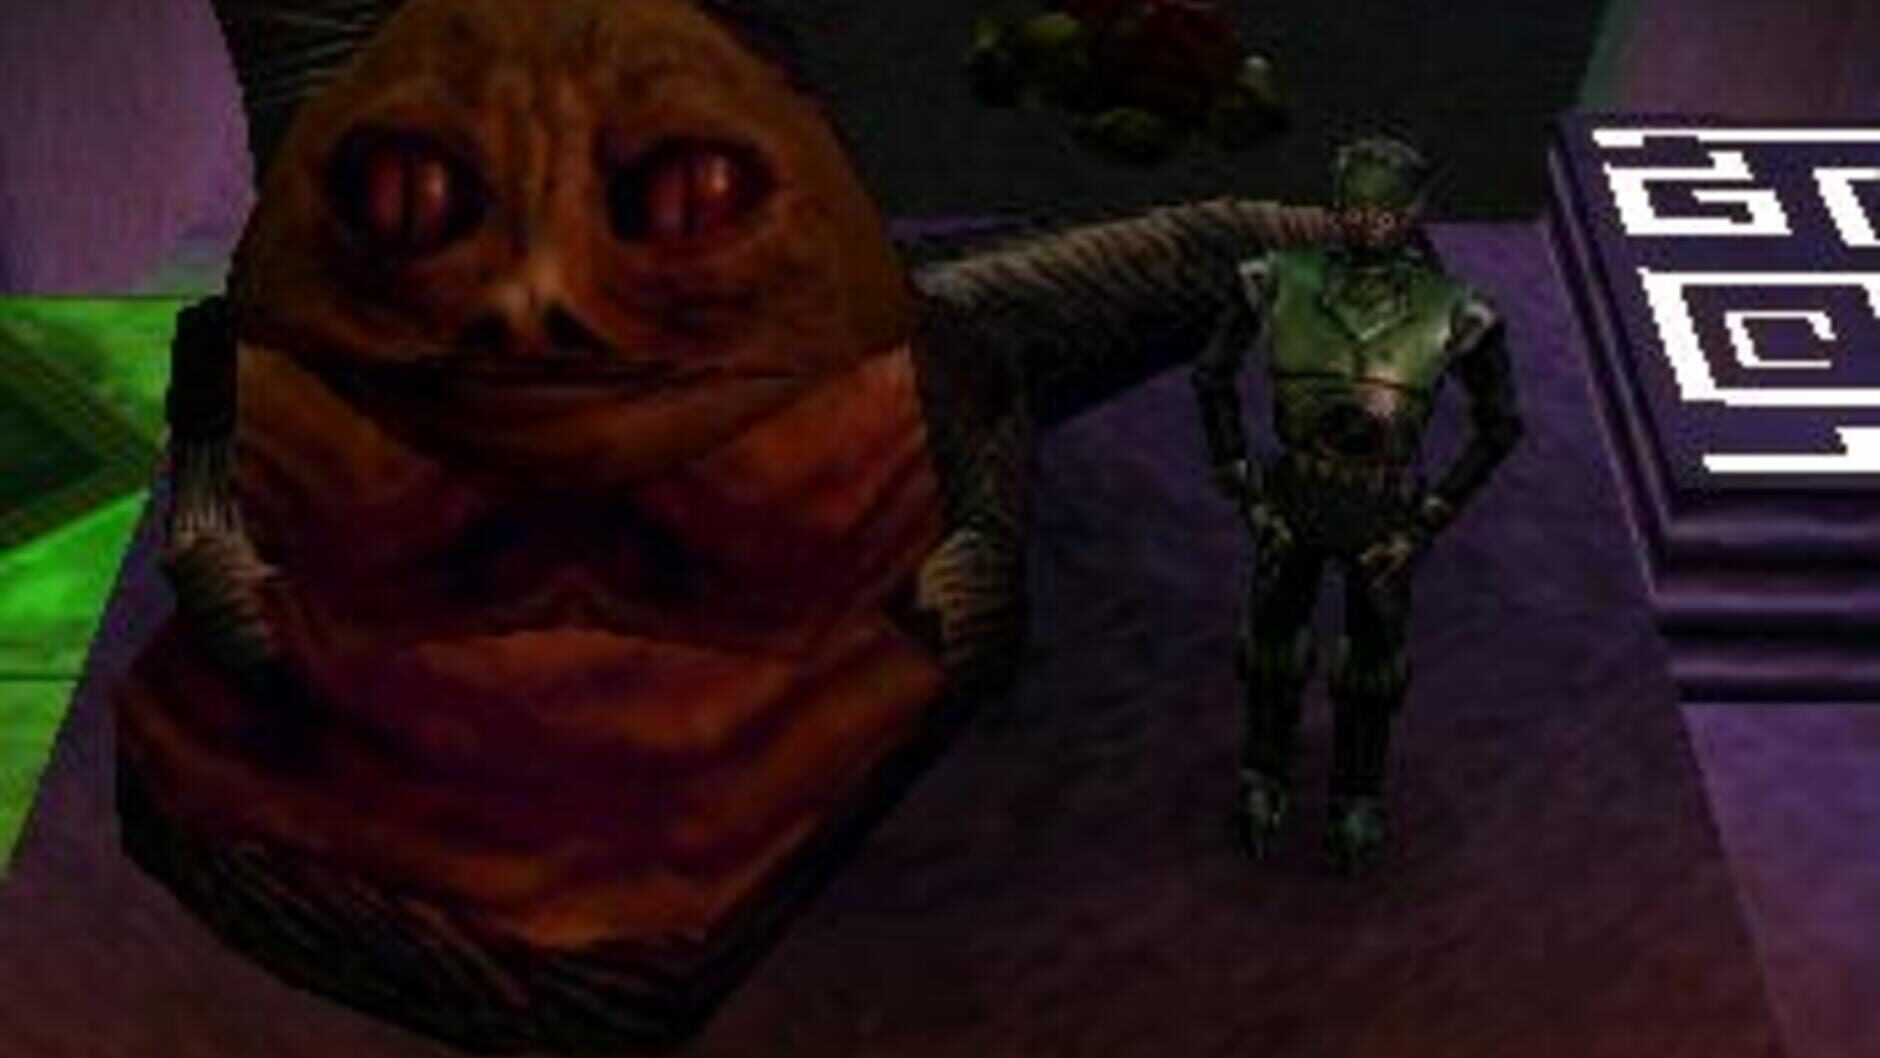 Star Wars Episode I: The Phantom Menace - 0